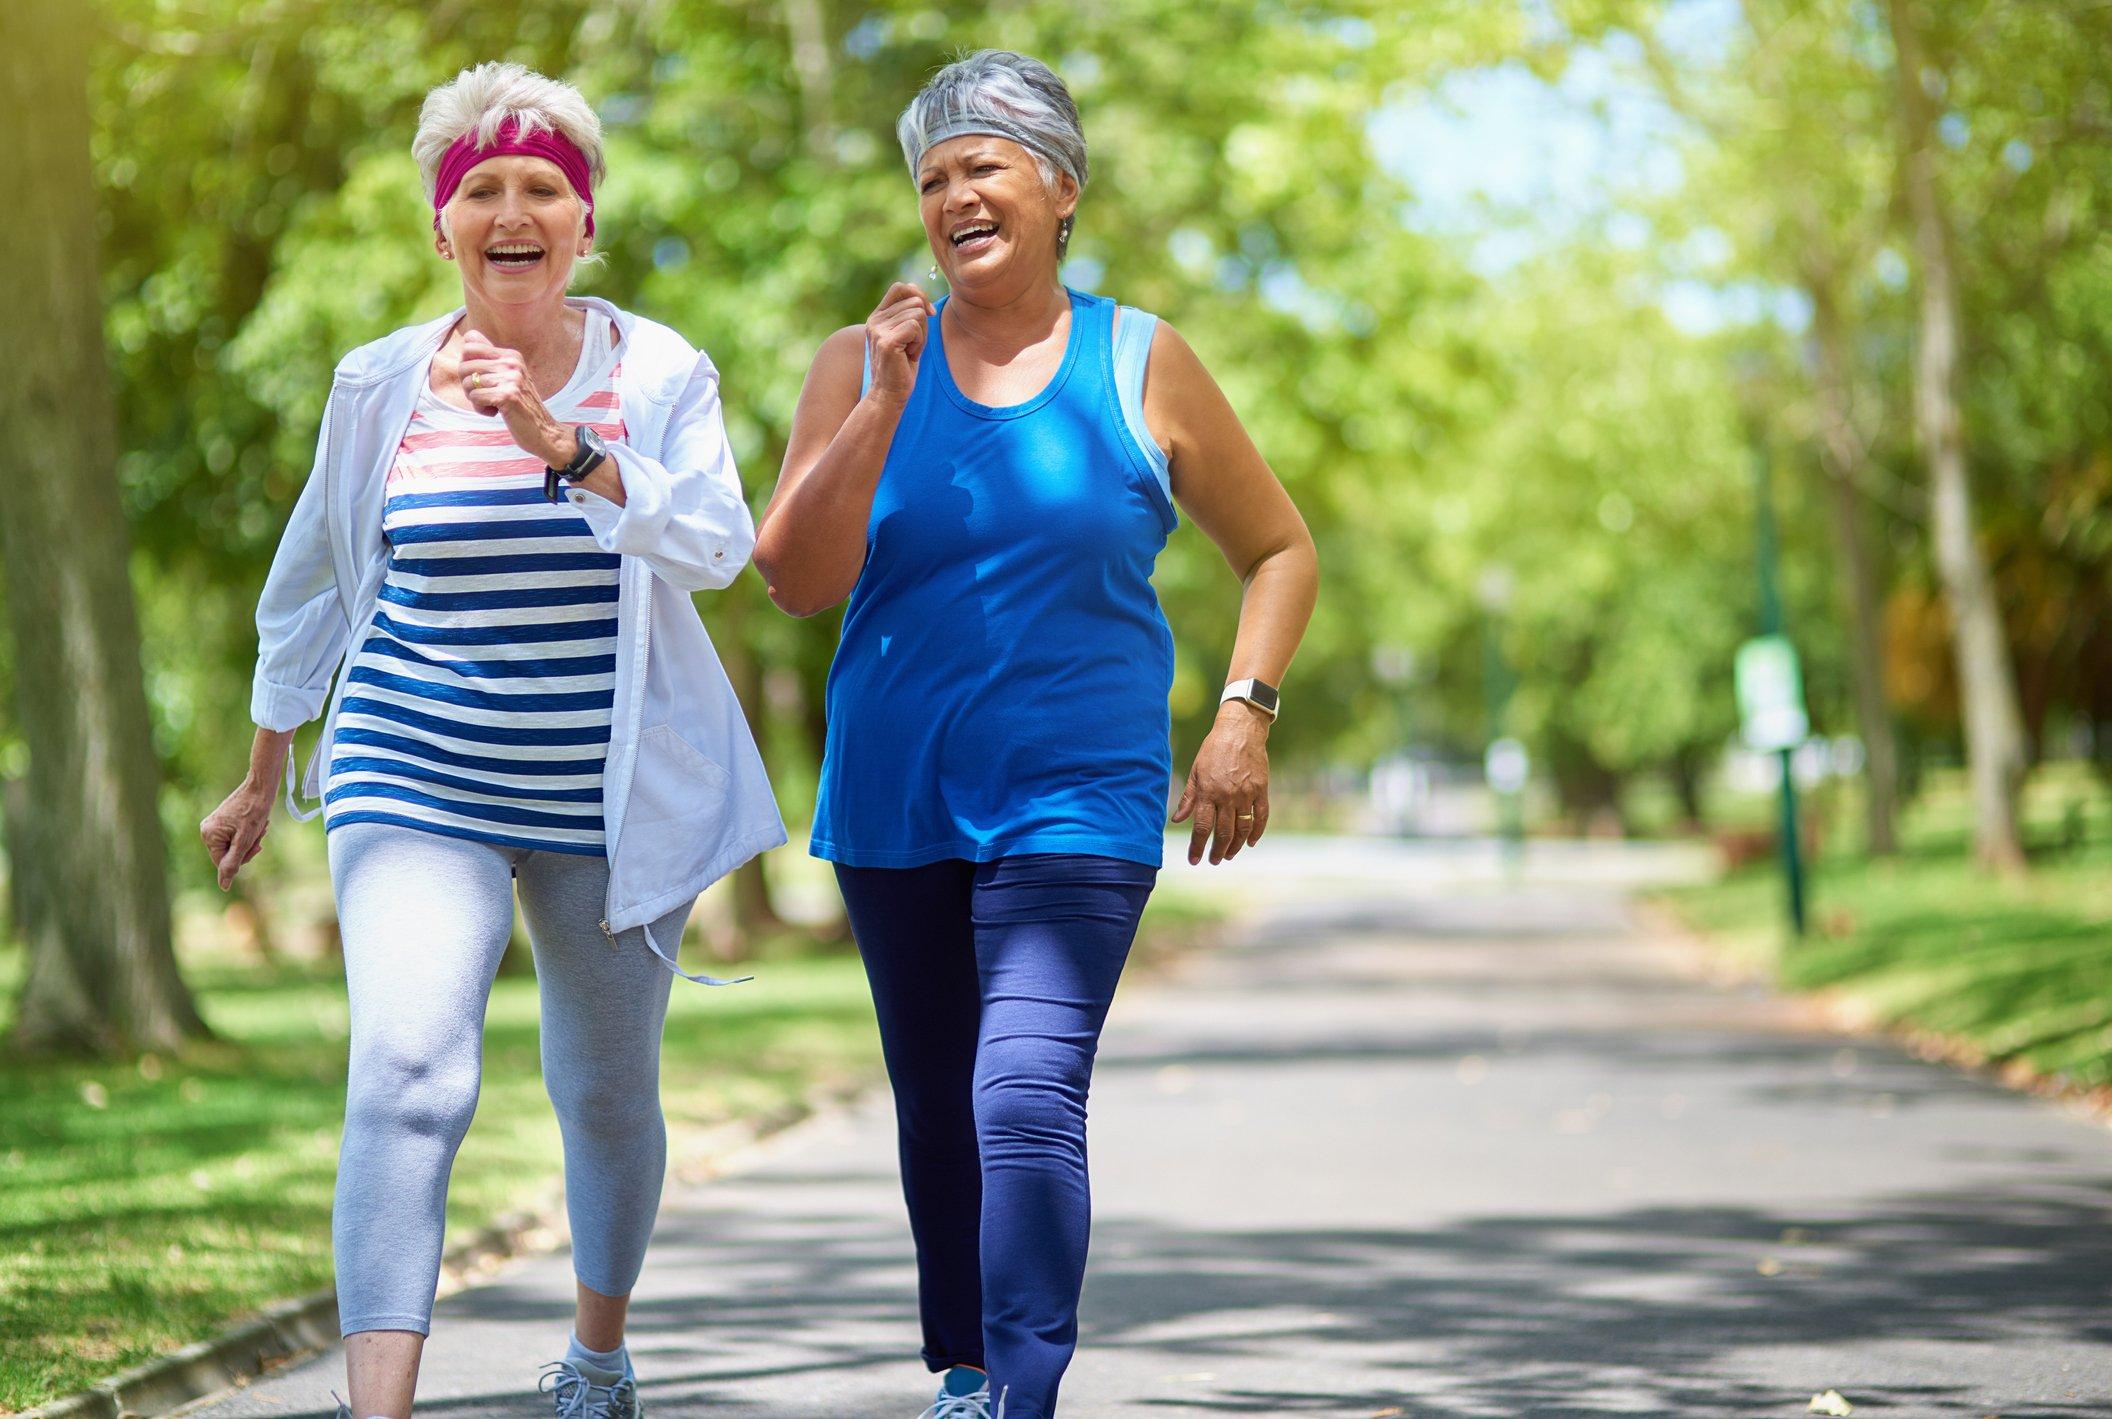 senior health walking